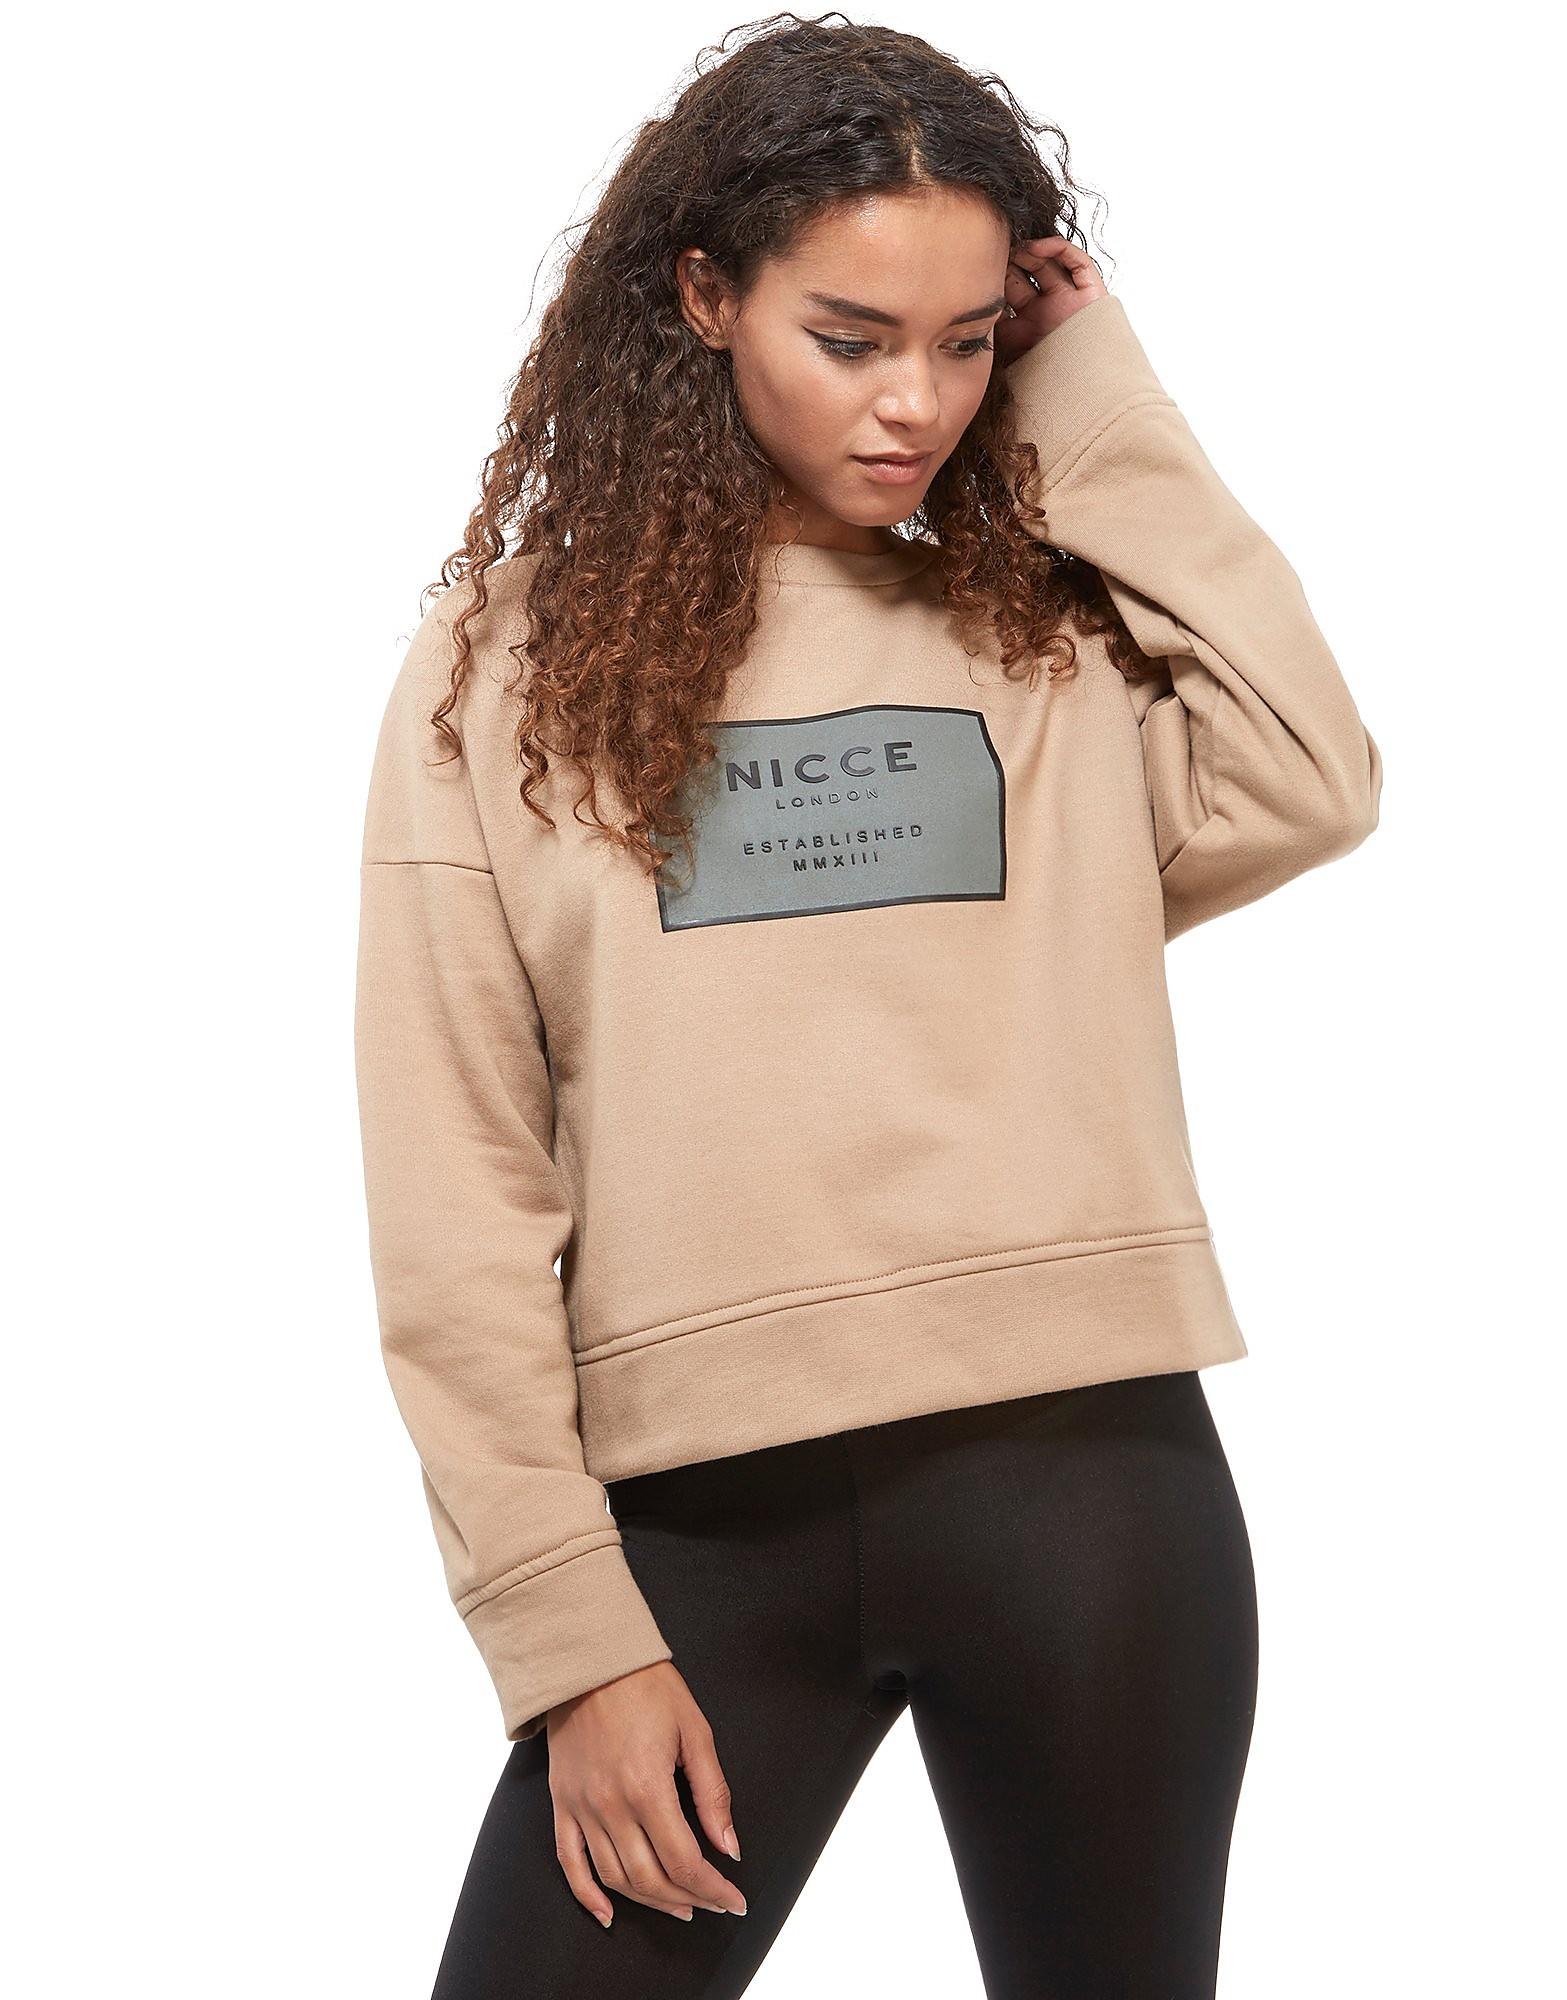 Nicce Box Logo Cropped Sweatshirt